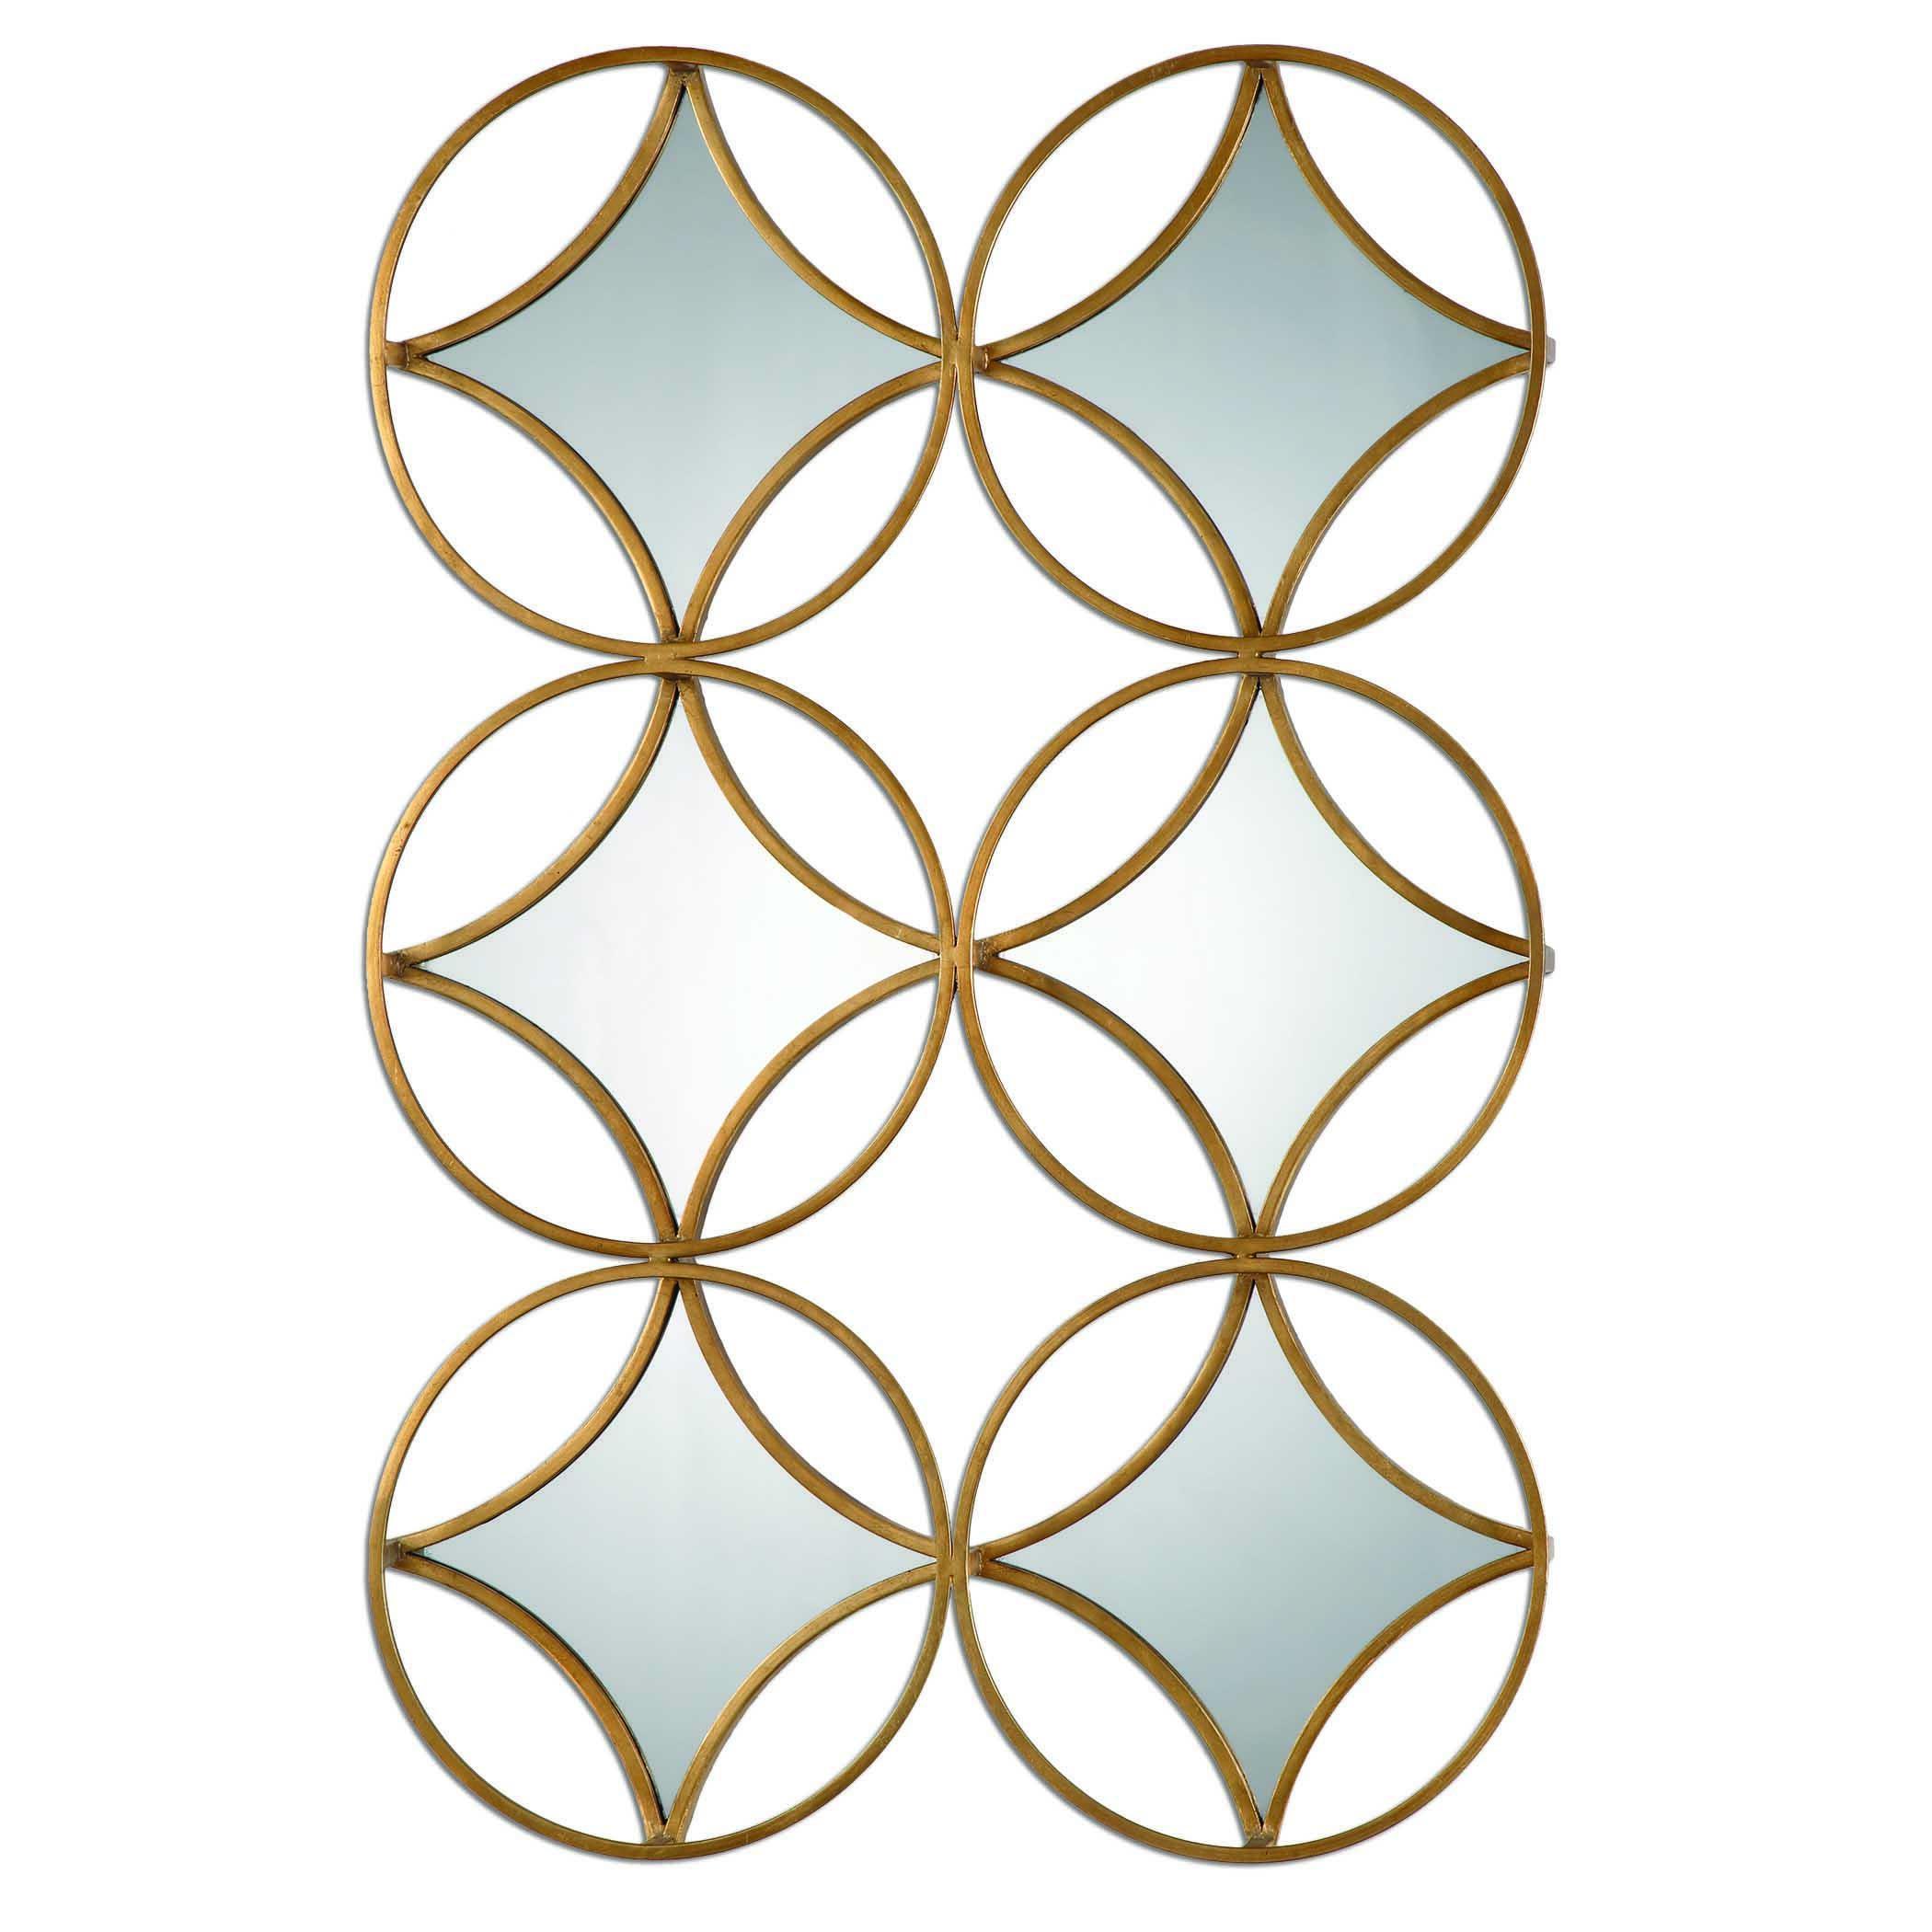 Uttermost Mirrors Zamora Geometric Mirror - Item Number: 07696